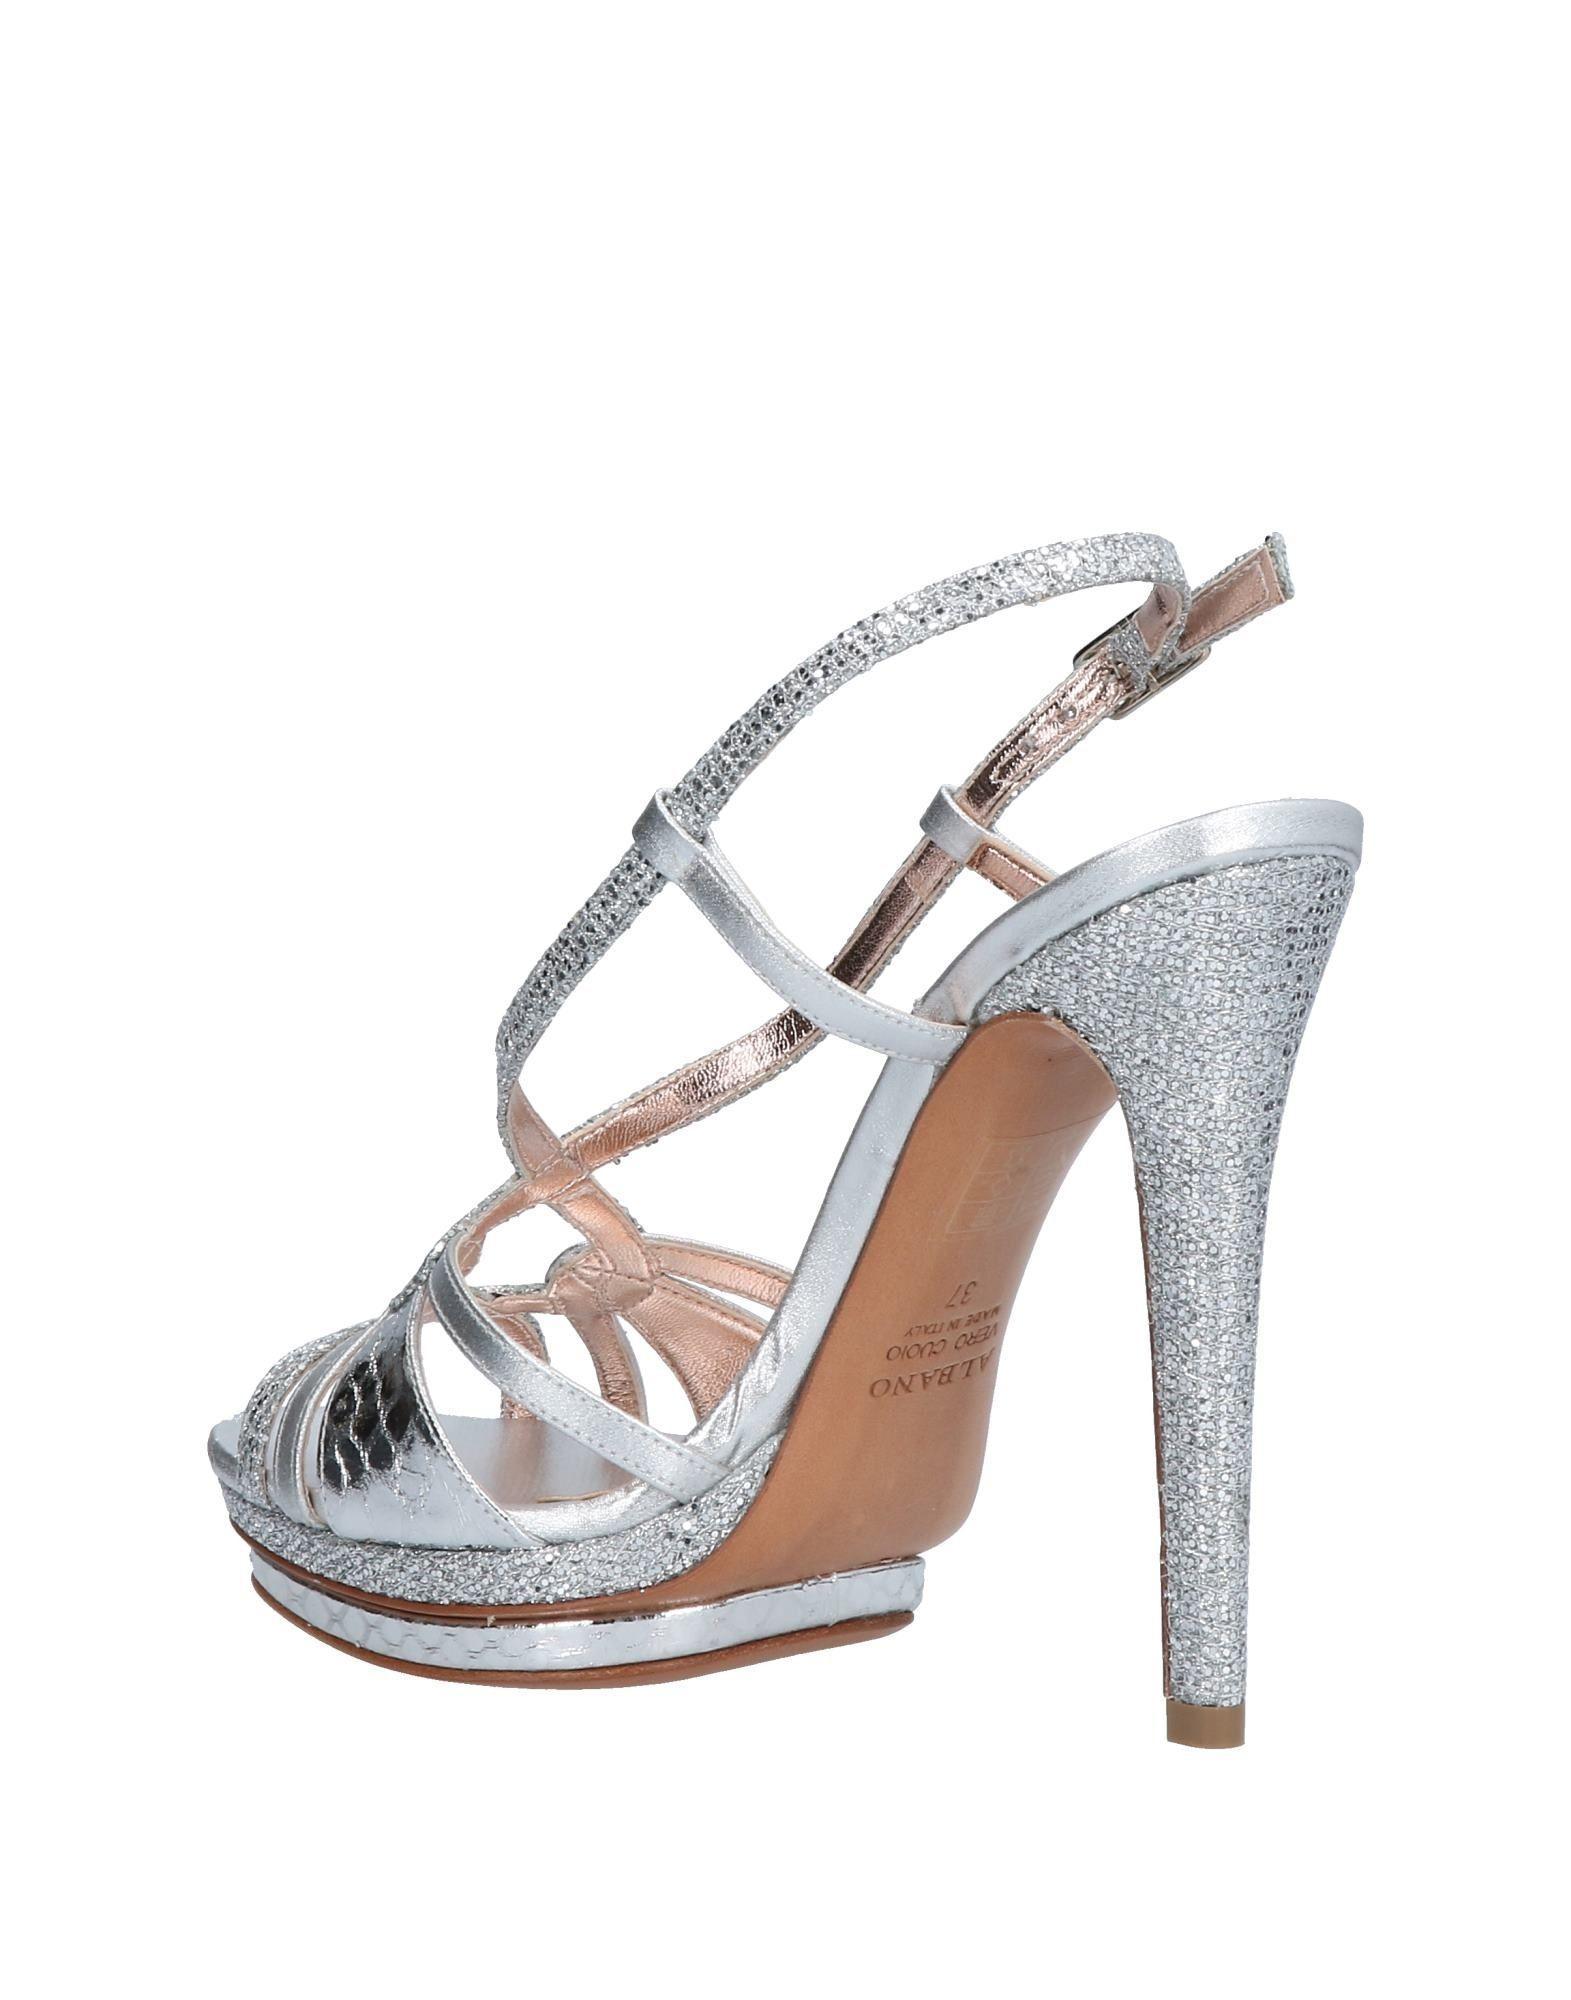 808c7abe0f2d Lyst - Albano Sandals in Metallic